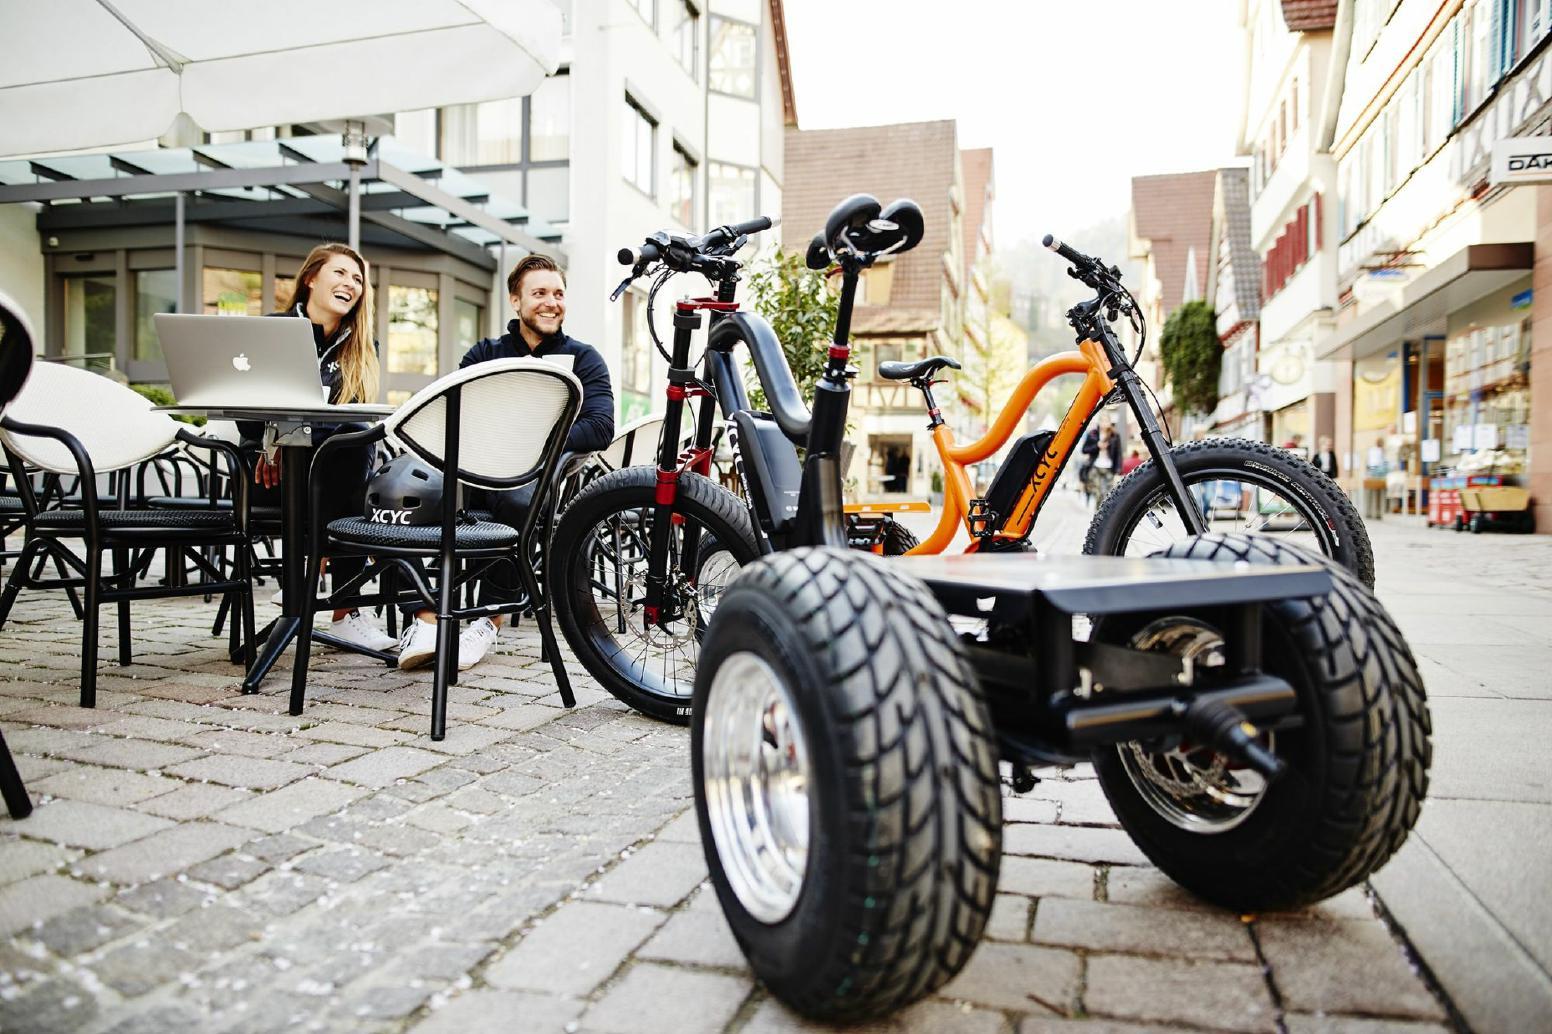 XCYC Lasten e-Bike Pick-Up Performance 2019